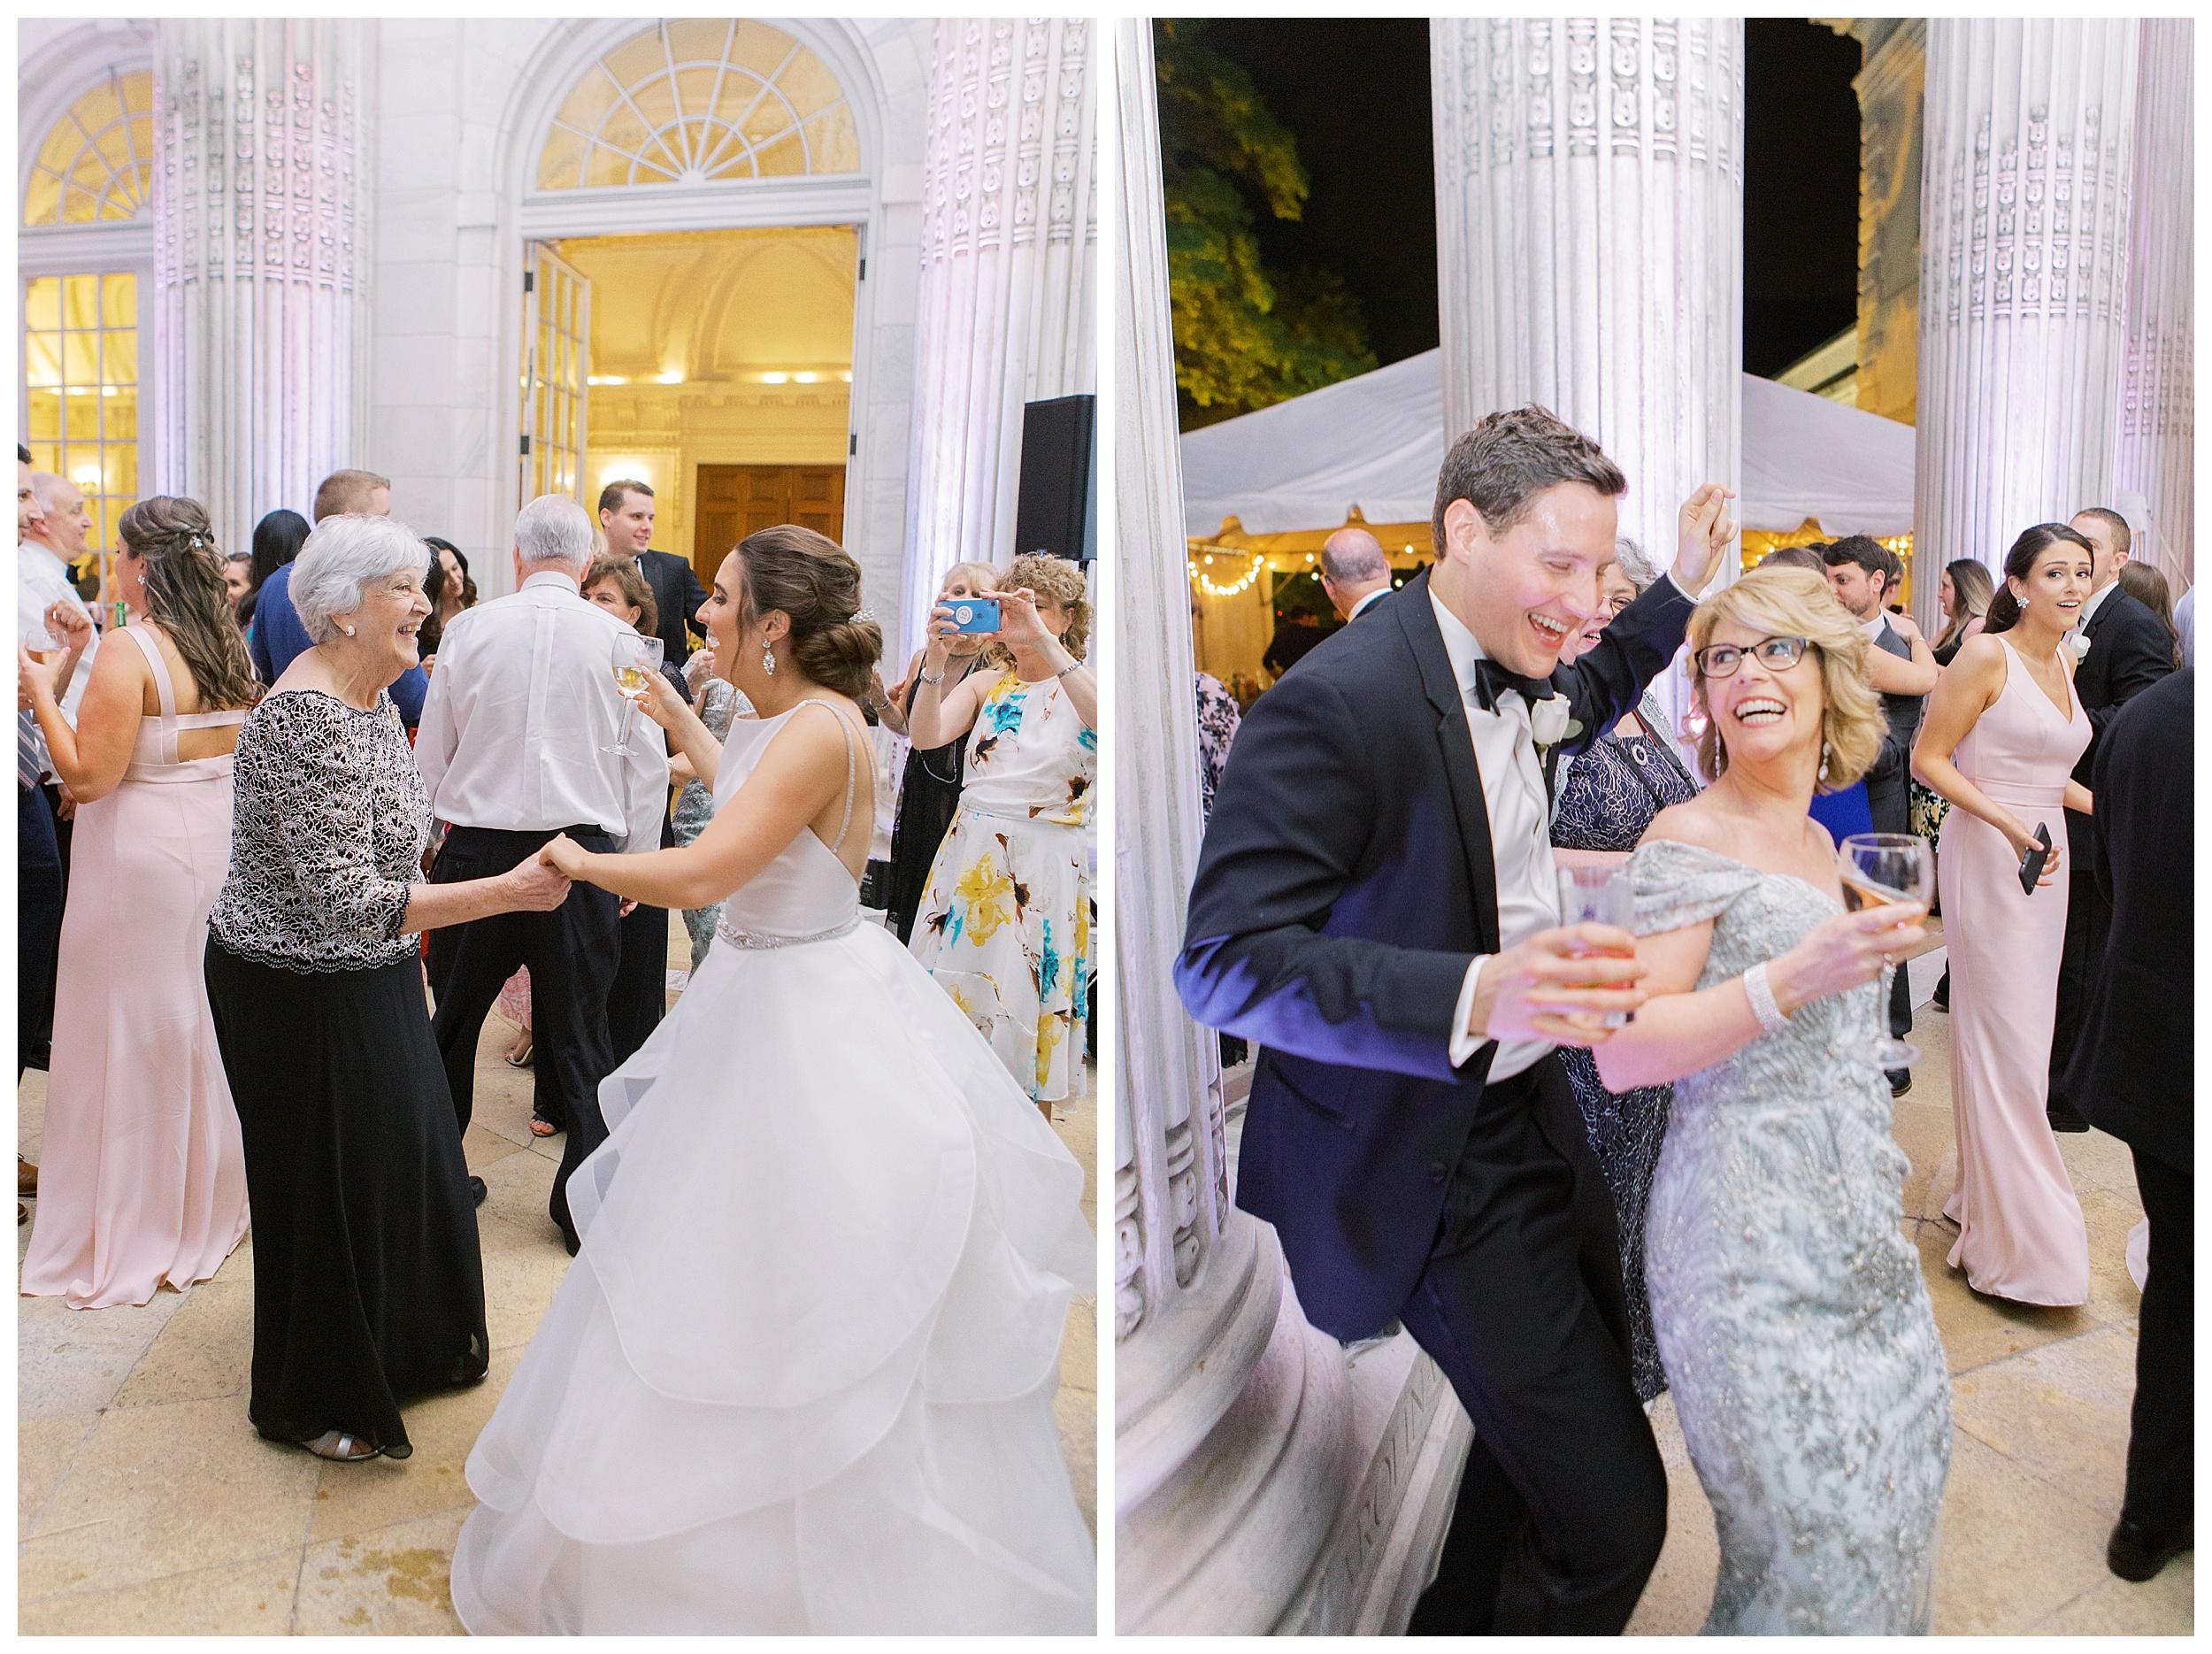 DAR Constitution Hall Wedding Wedding | Daughters of the American Revolution Wedding | District of Columbia Film Wedding Photographer Kir Tuben_0137.jpg